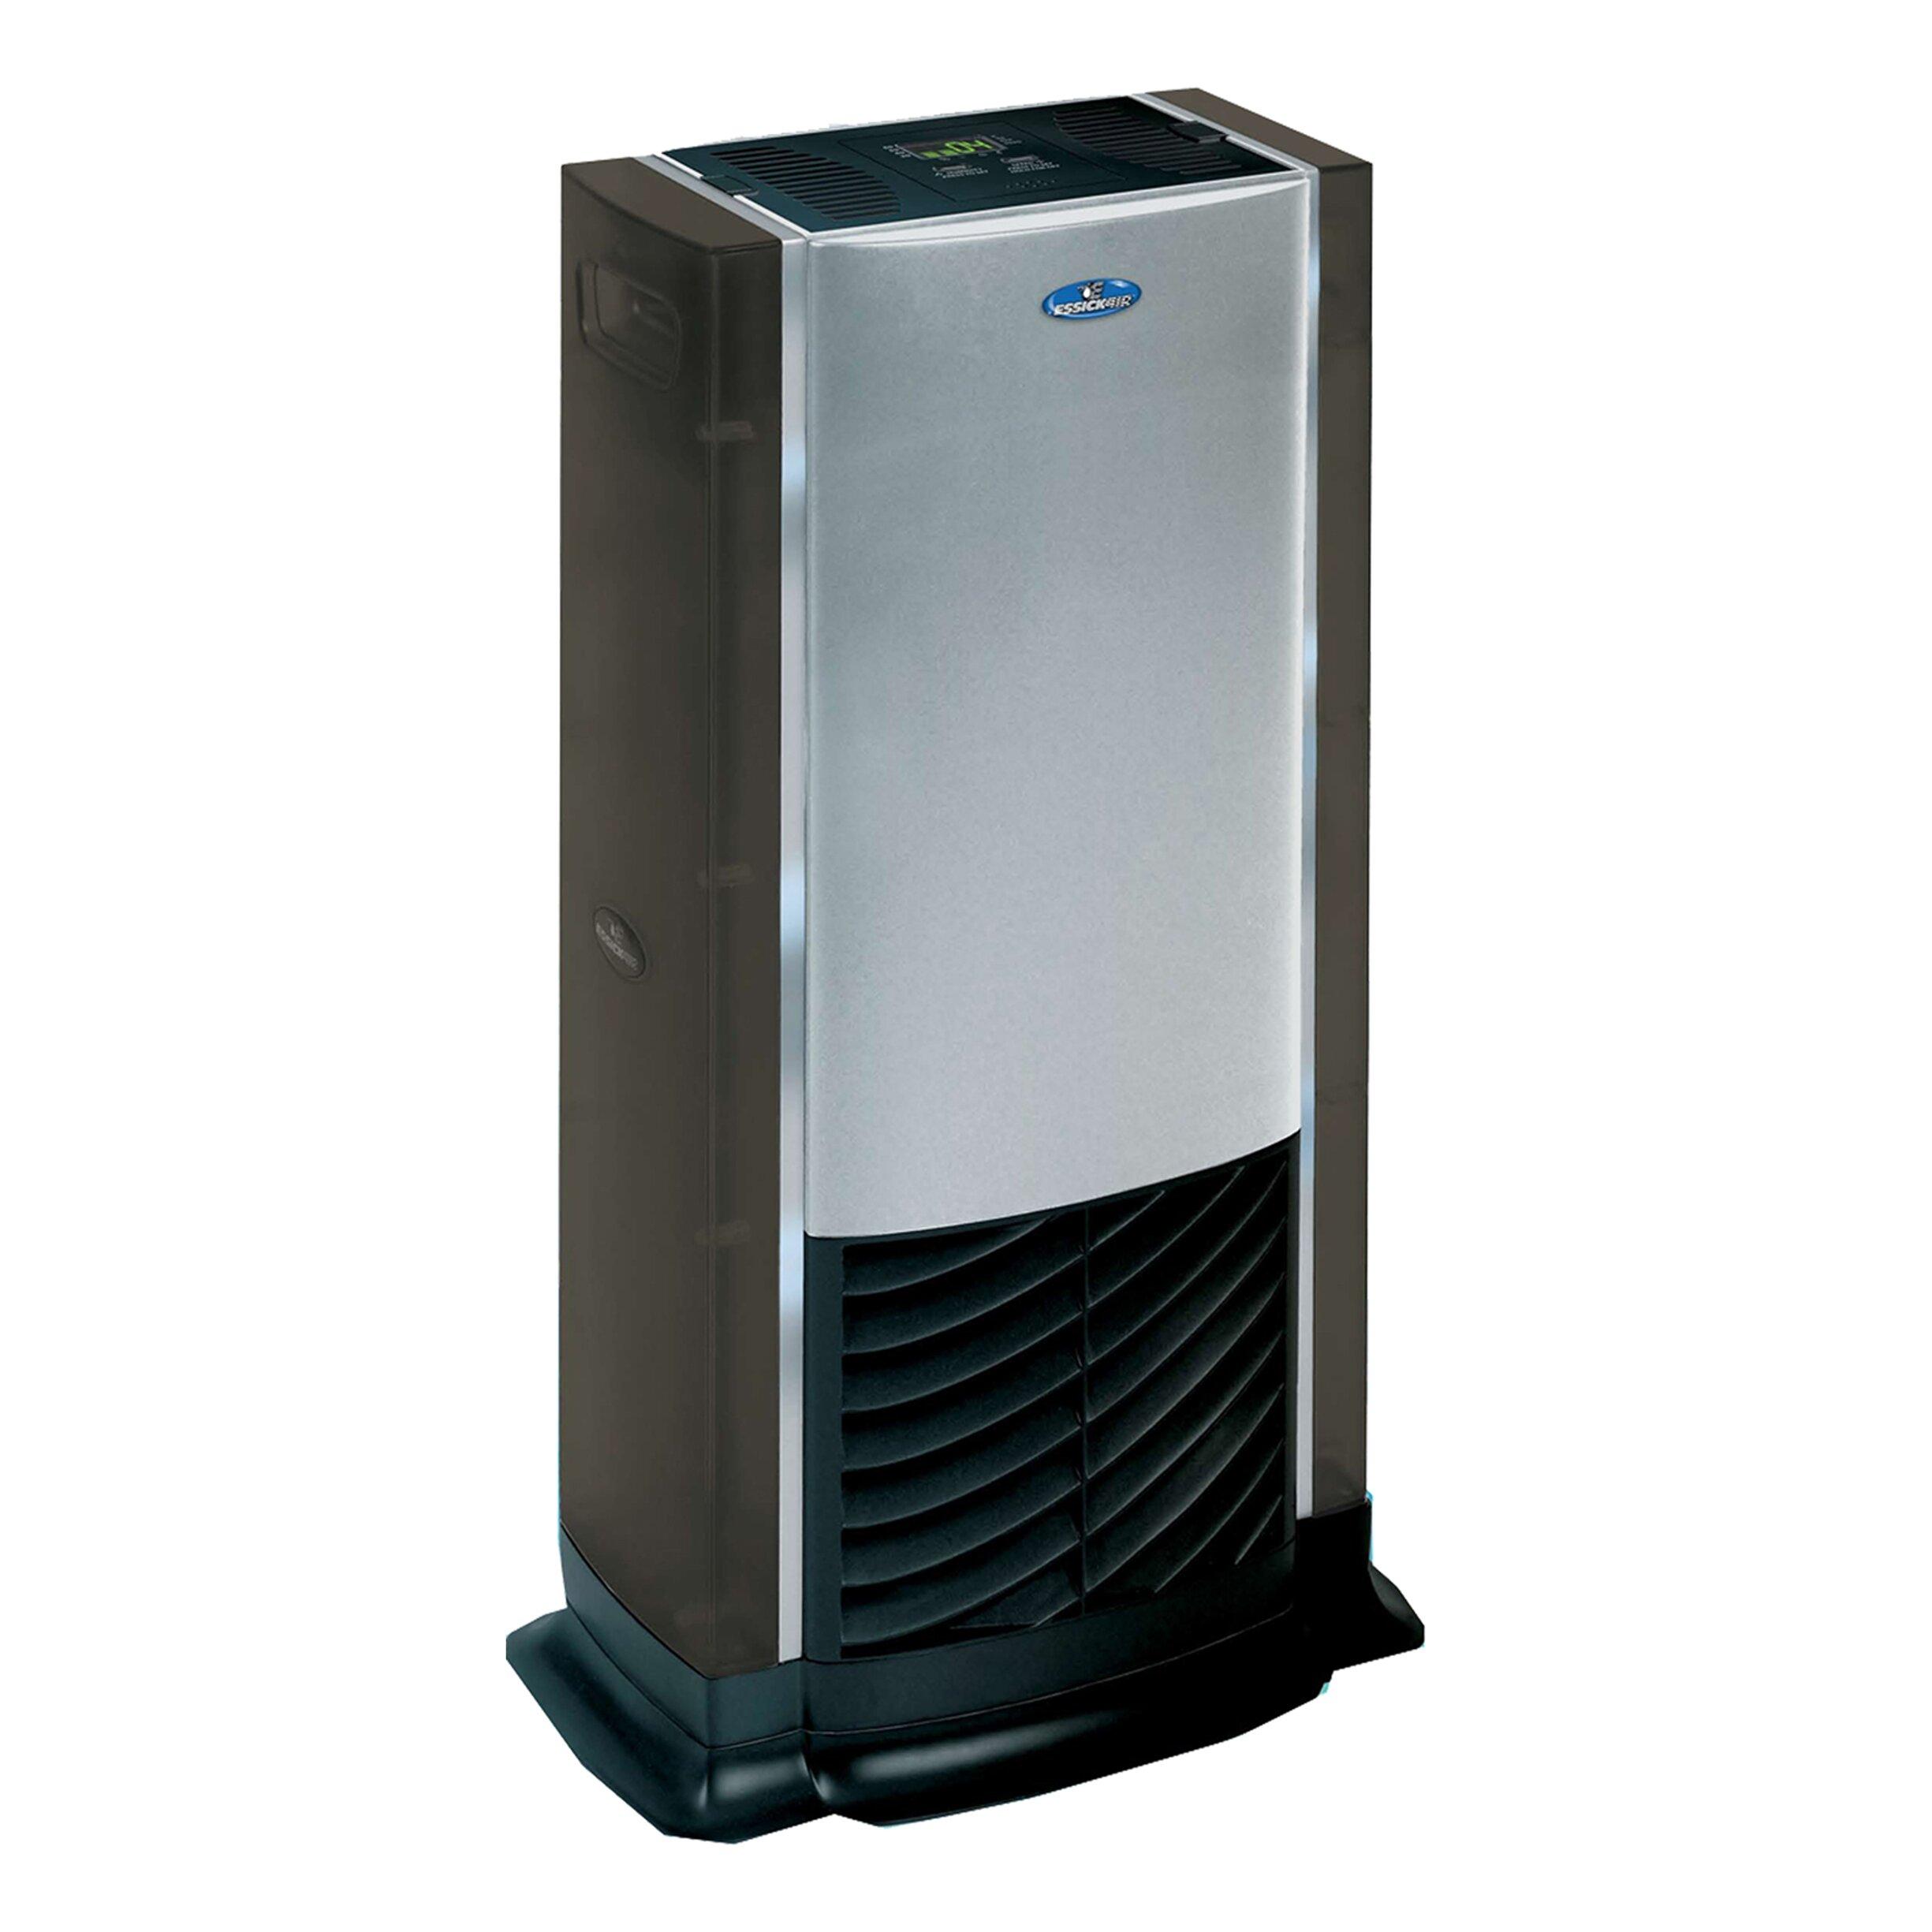 Aircare 2 Gal Evaporative Humidifier Amp Reviews Wayfair Ca